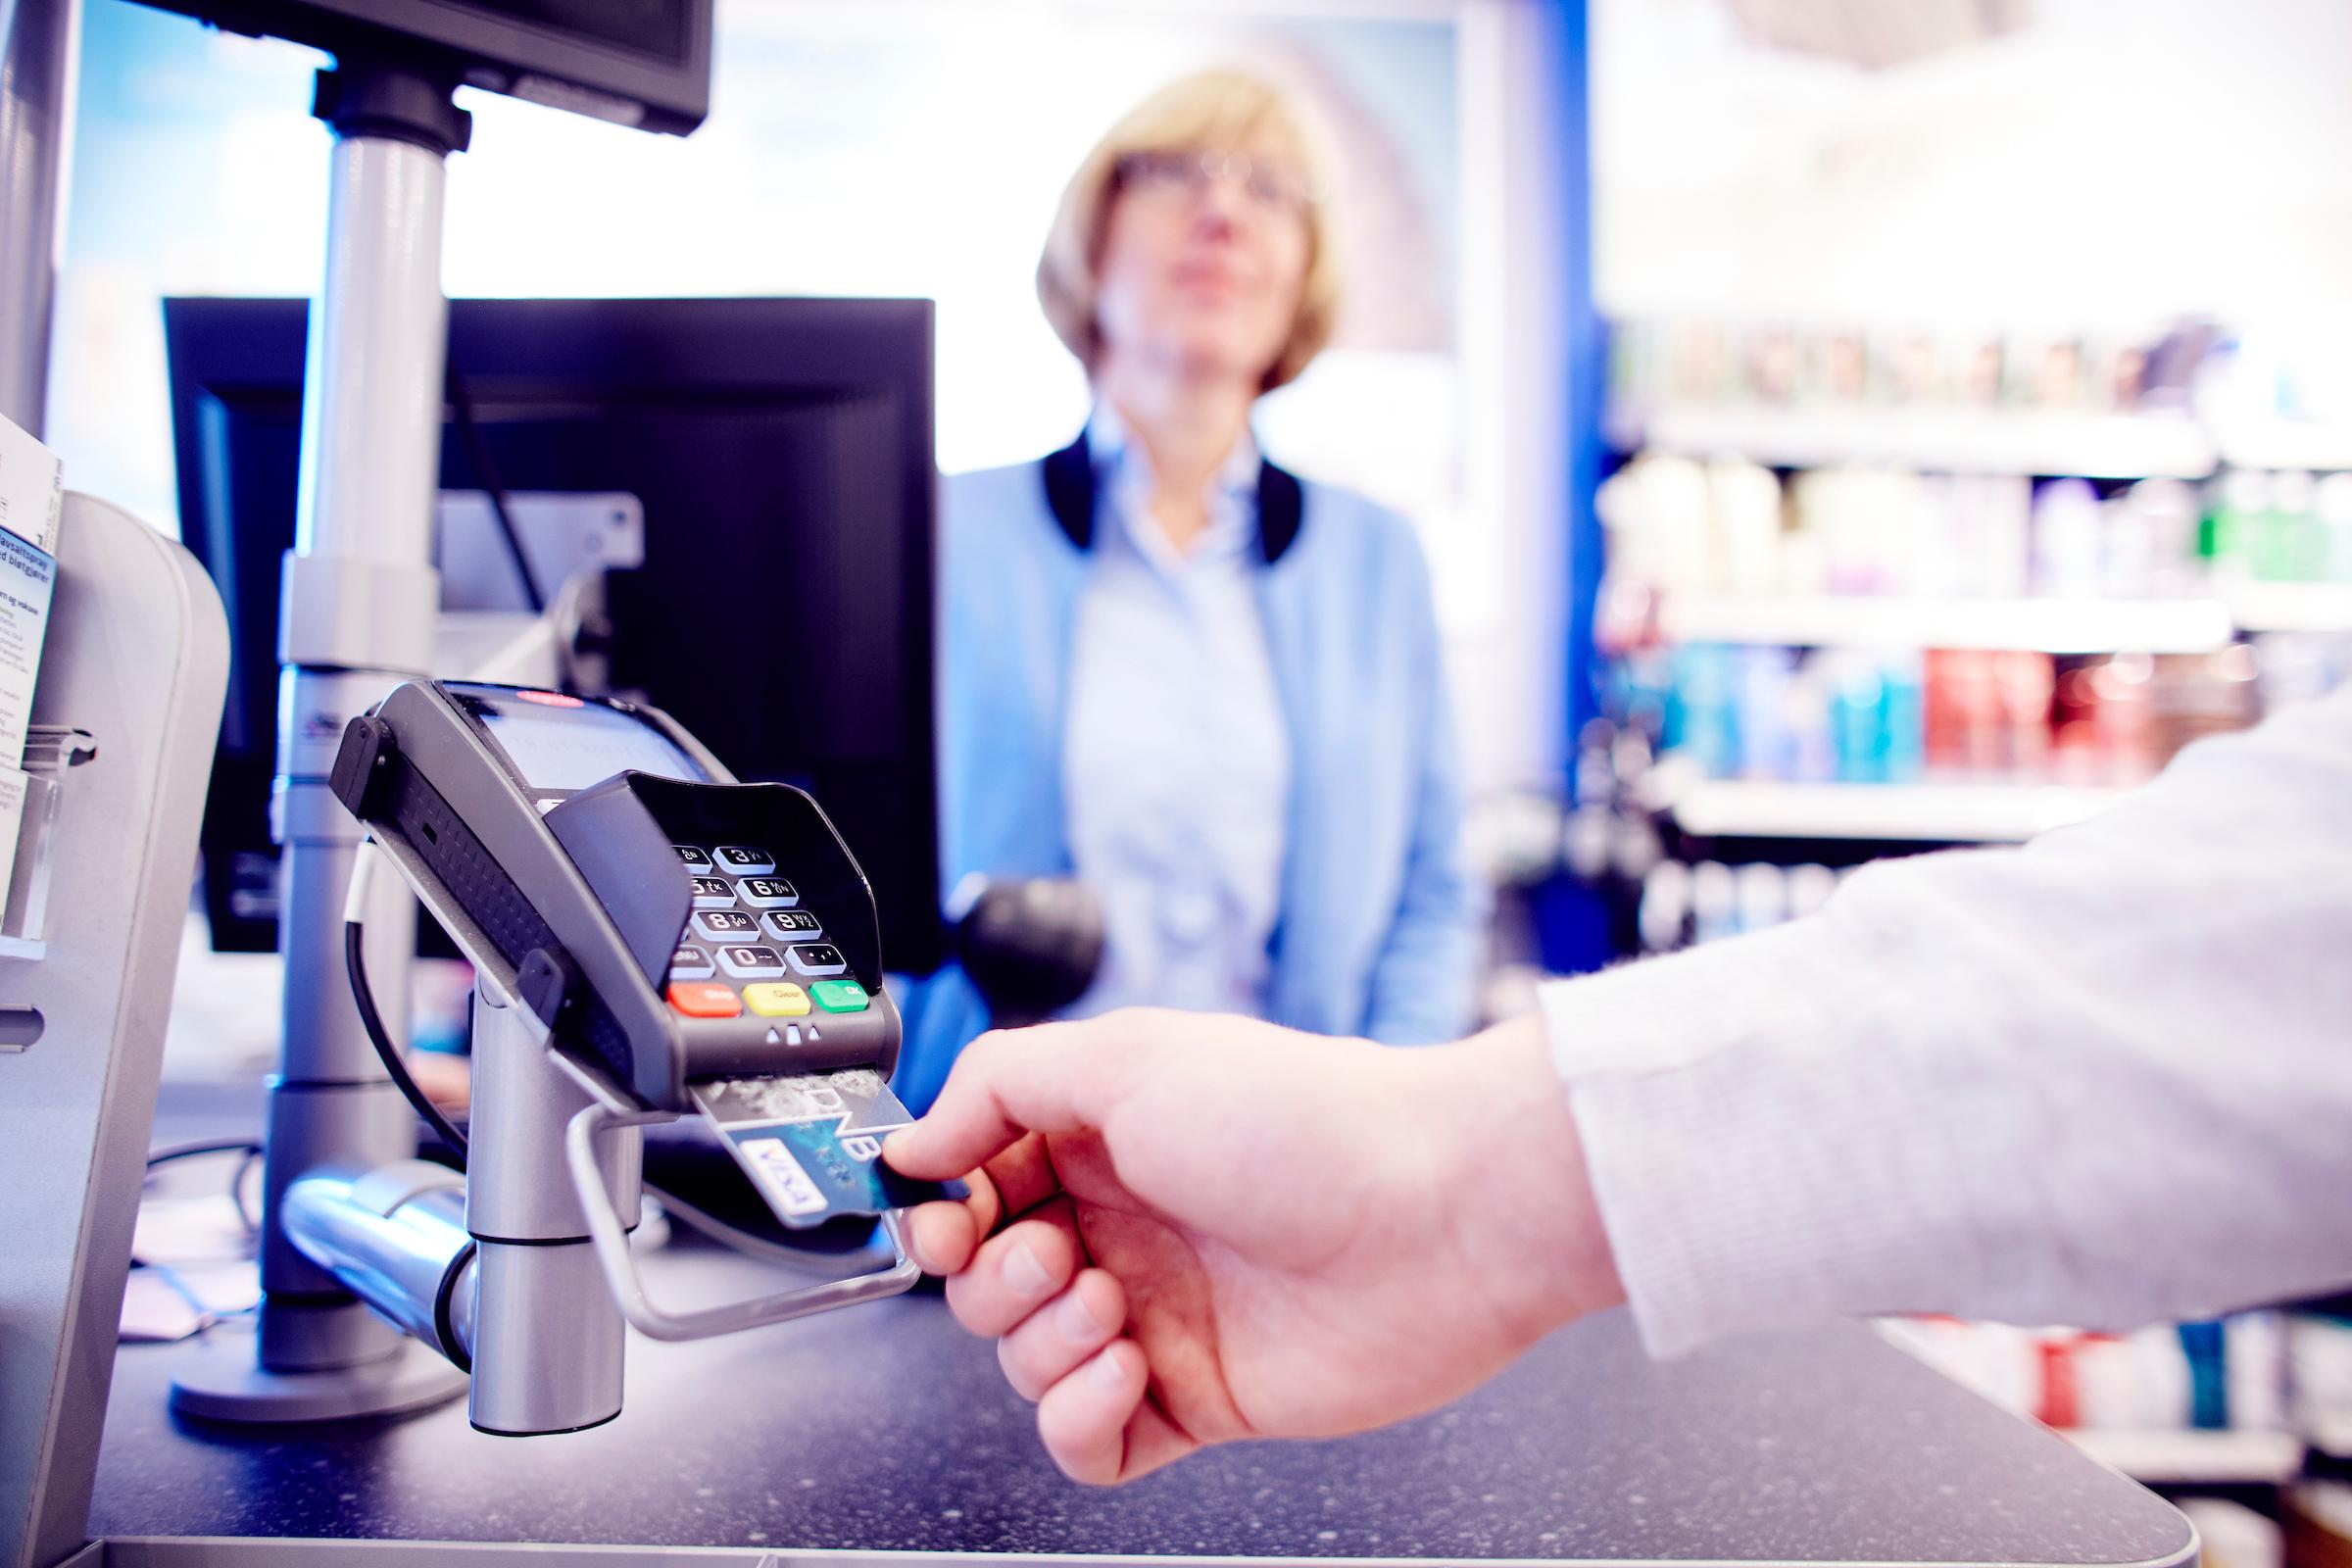 Apotekkunde bruker betalingsterminal på apotek